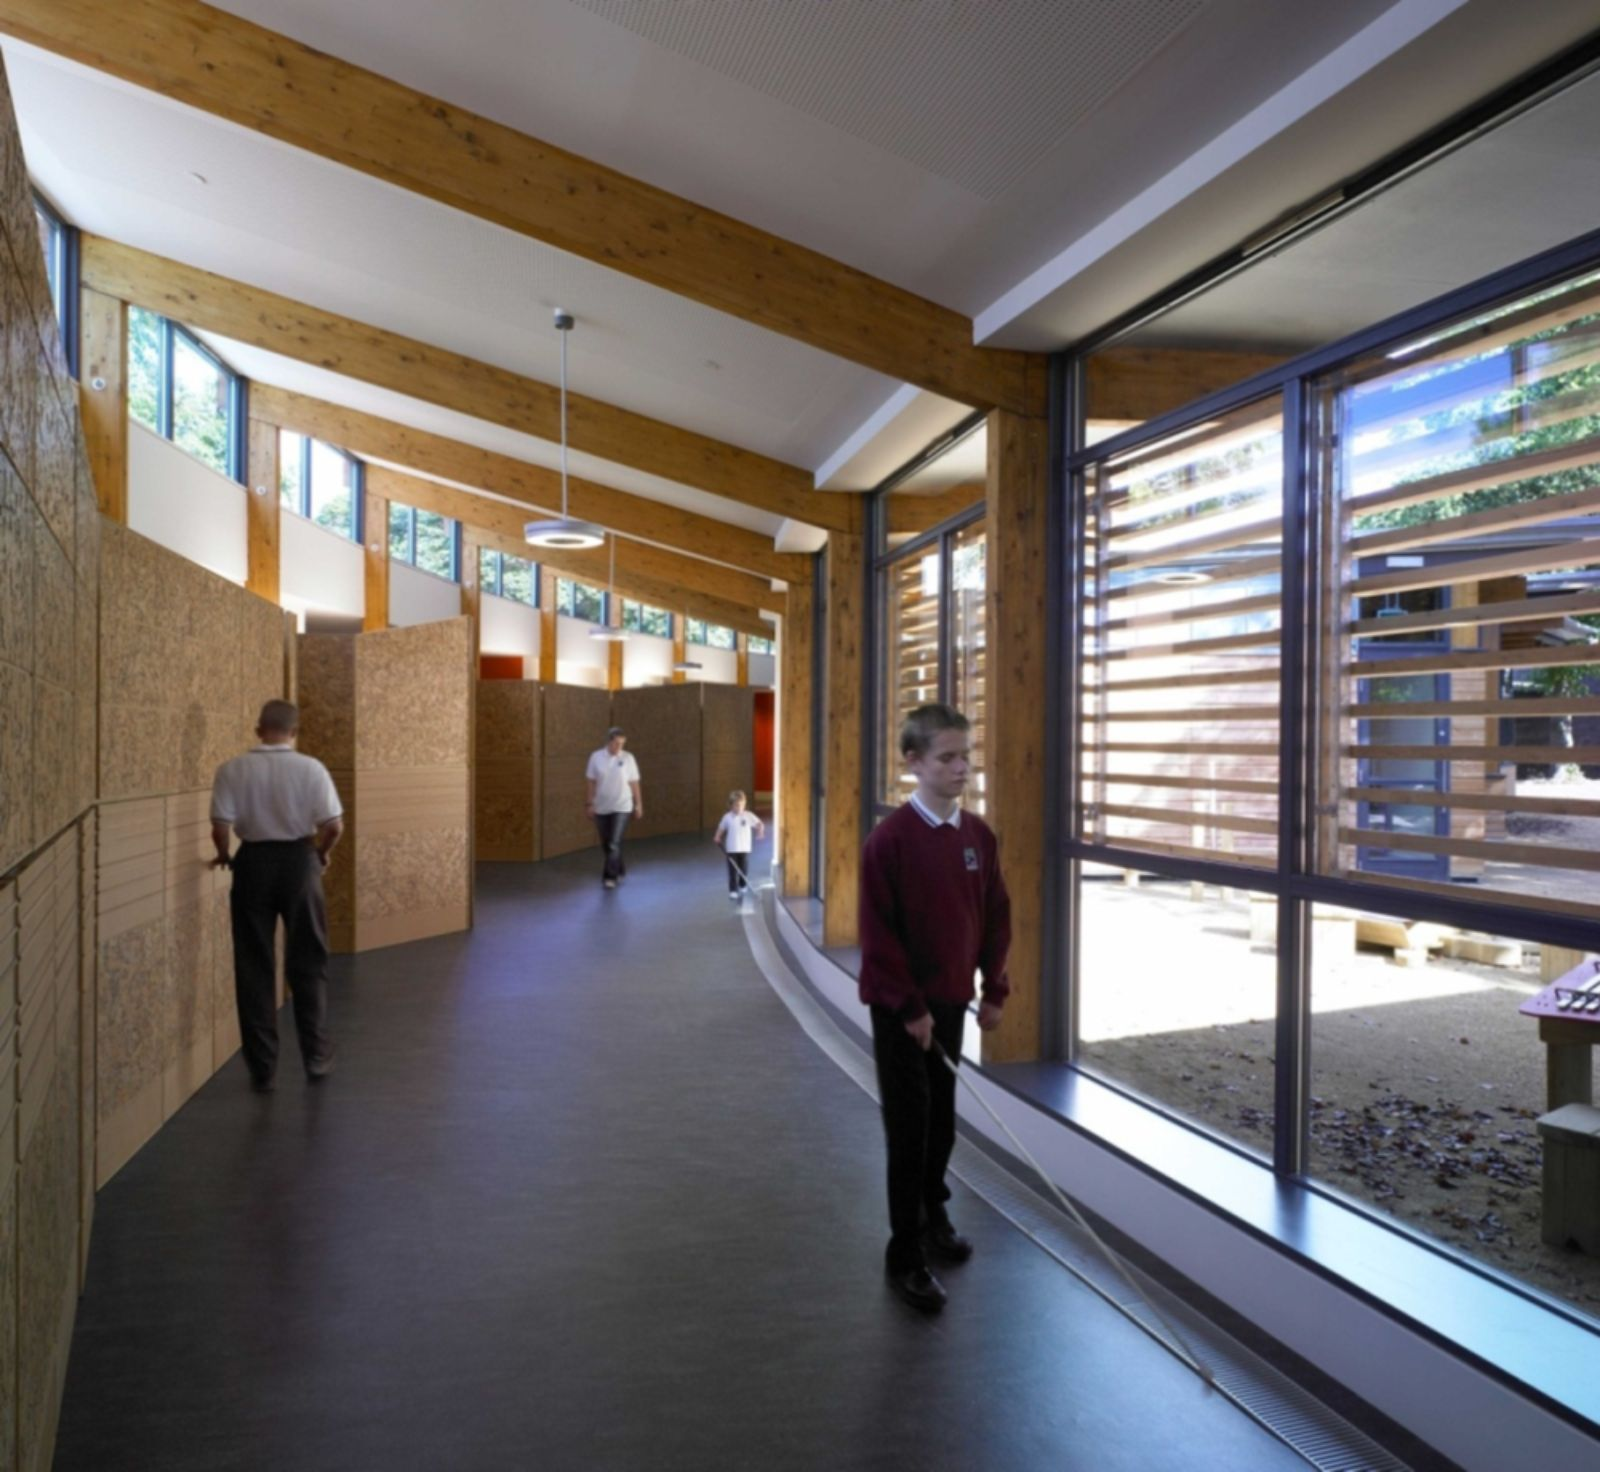 School Interior Design: Hazelwood School Glasgow By Alan Dunlop Architect